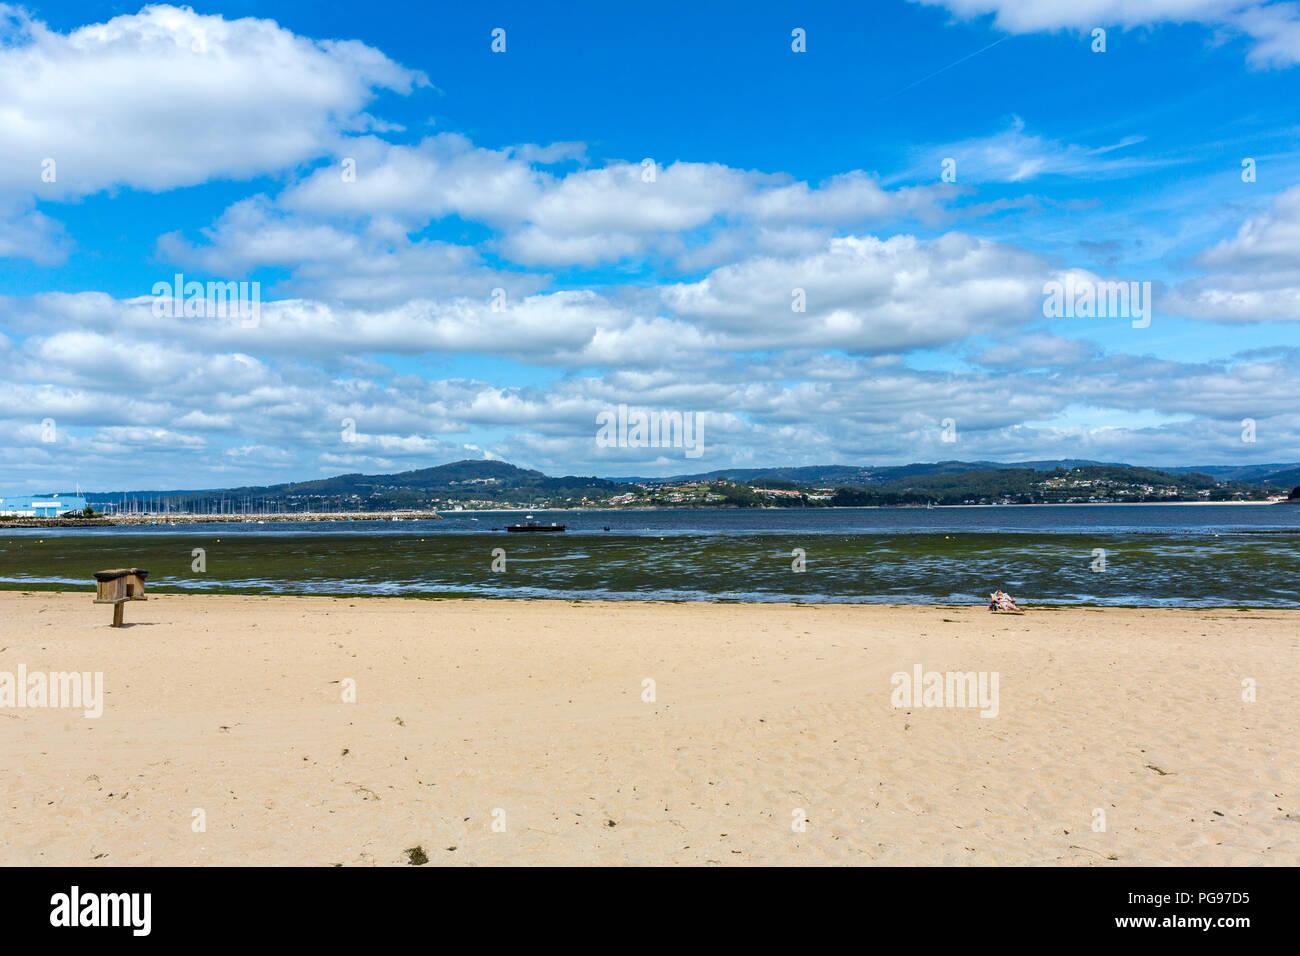 Woman alone taking the sunbath in Sada beach, Sada, A Coruña provints, Galicia, Spain - Stock Image